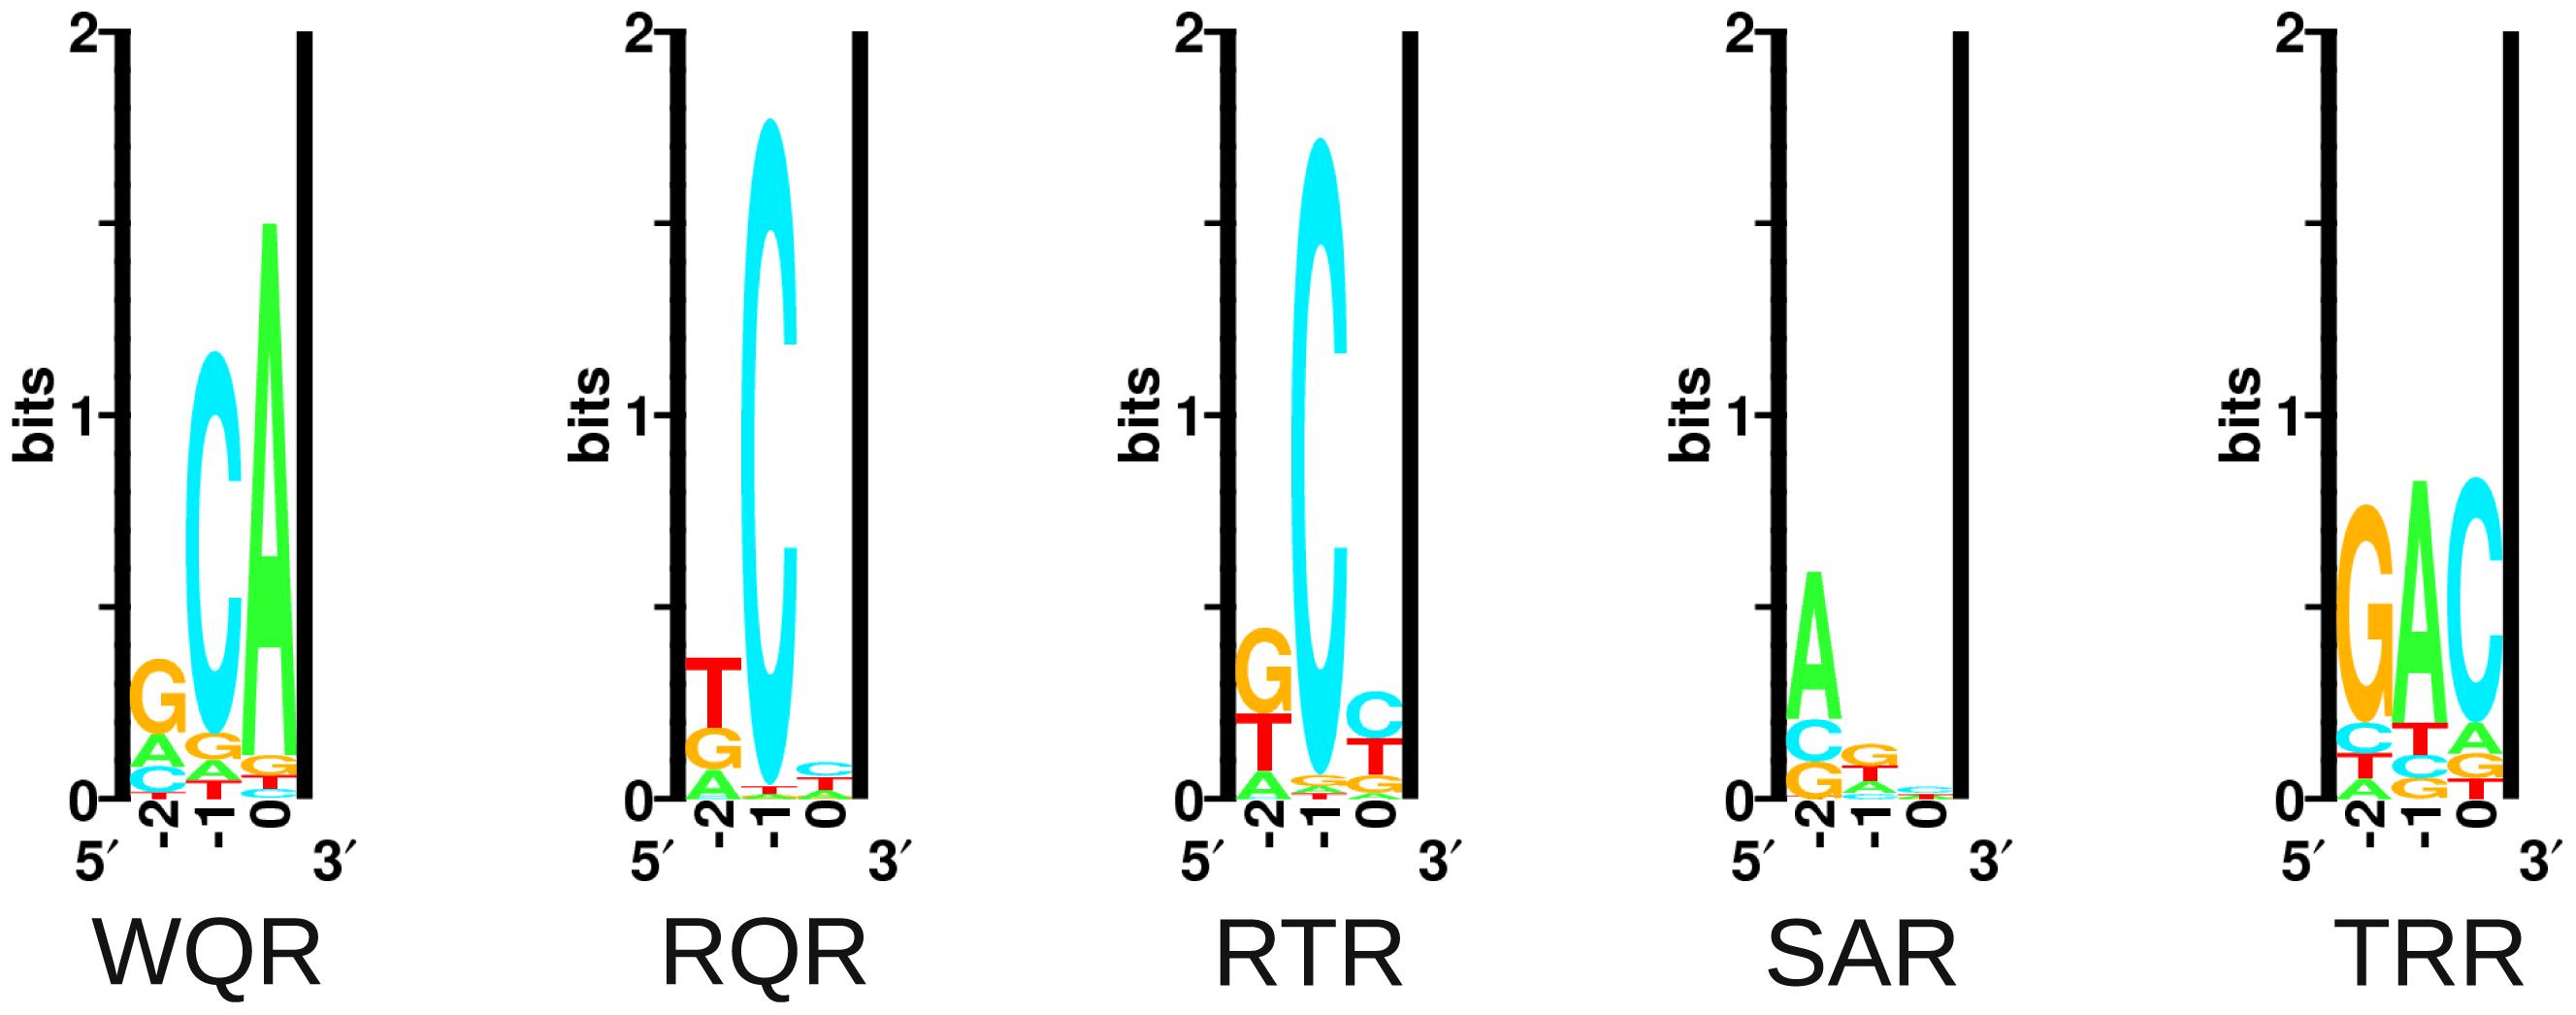 Energy logos for MarA variant binding sites.